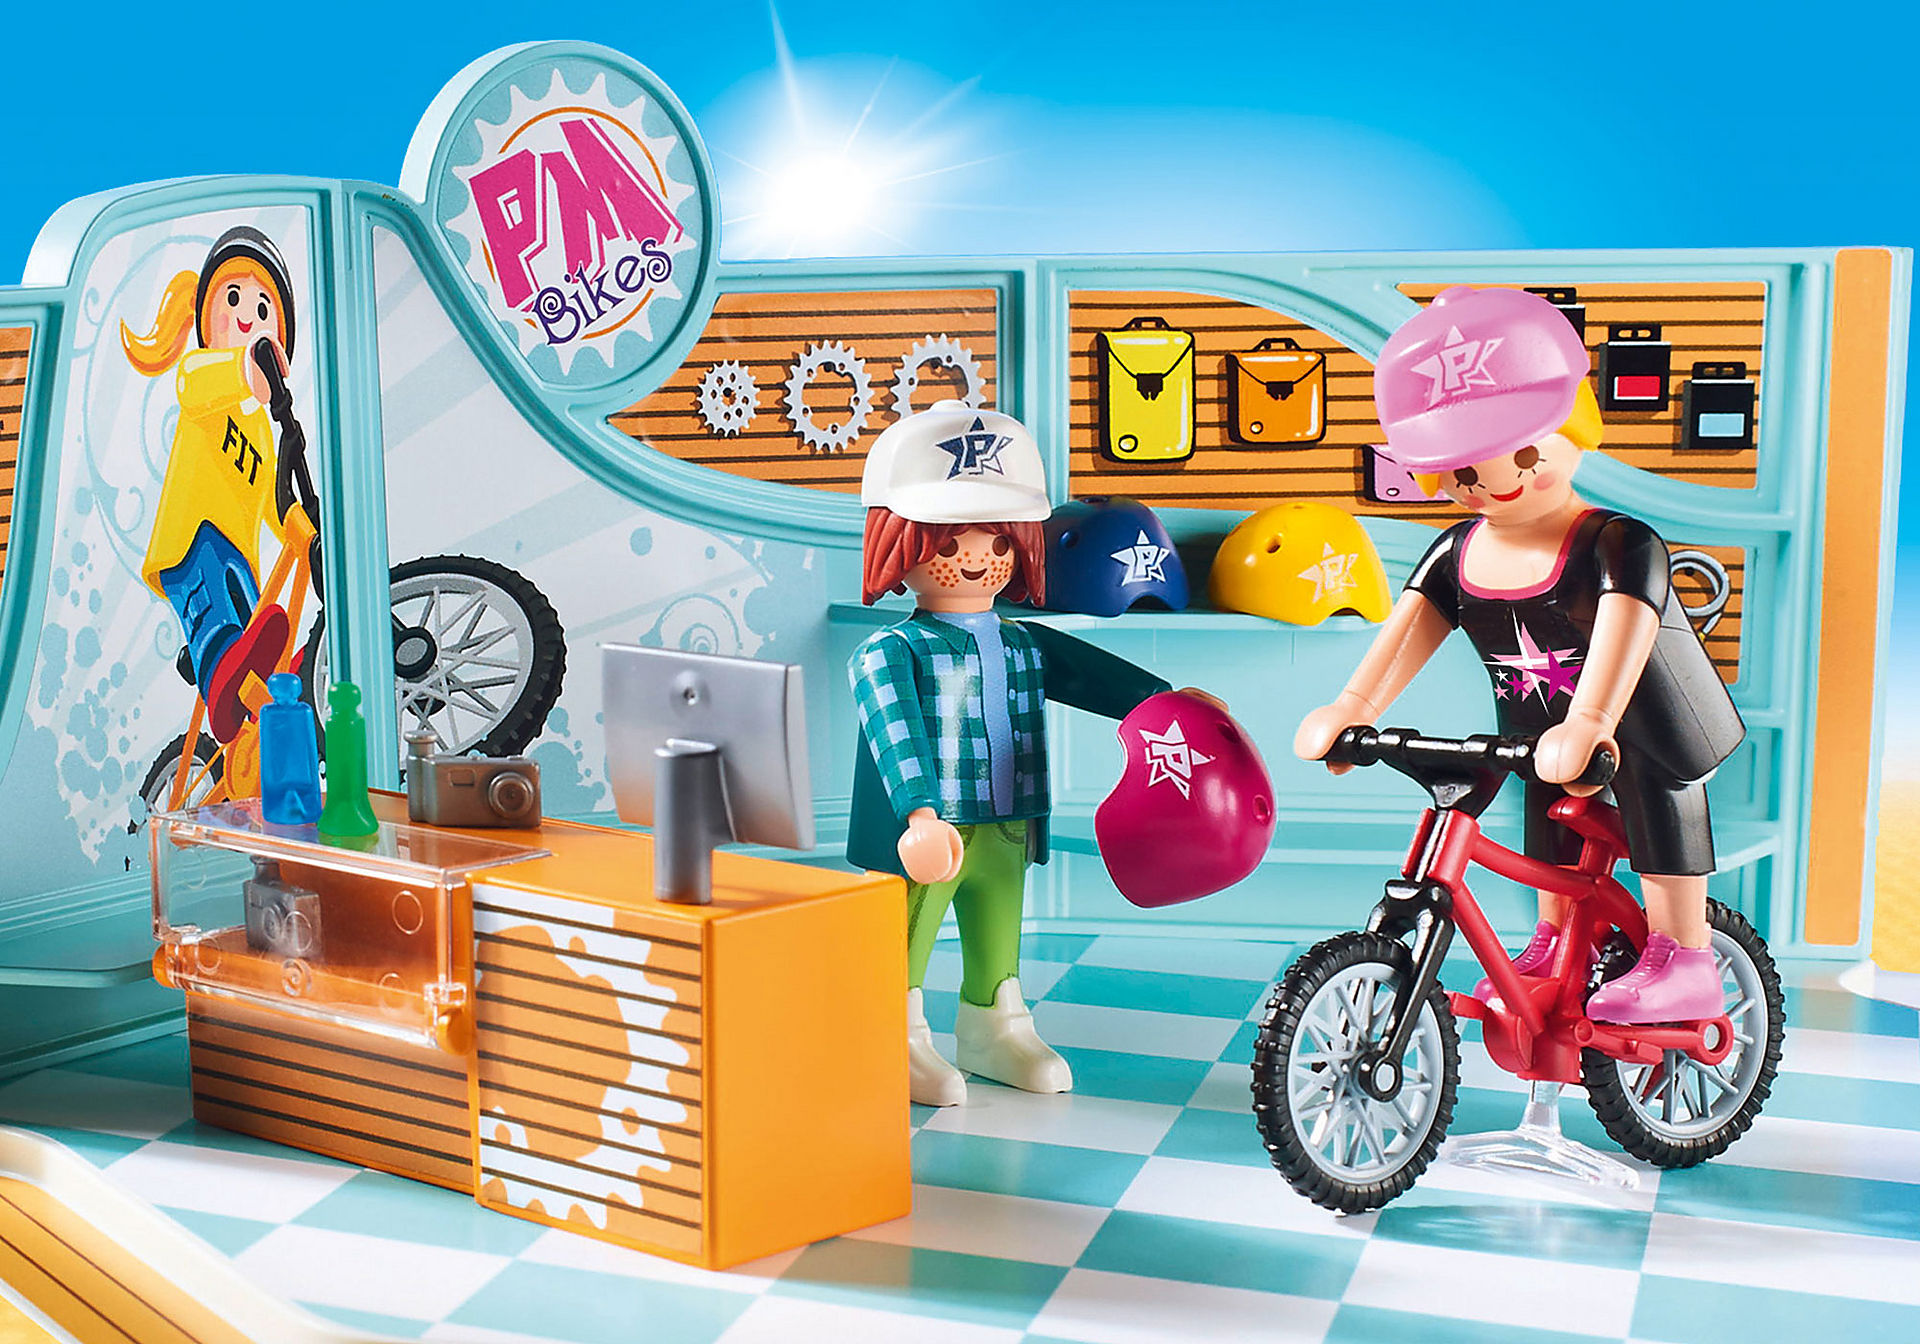 9402 Bike & Skate Shop zoom image5